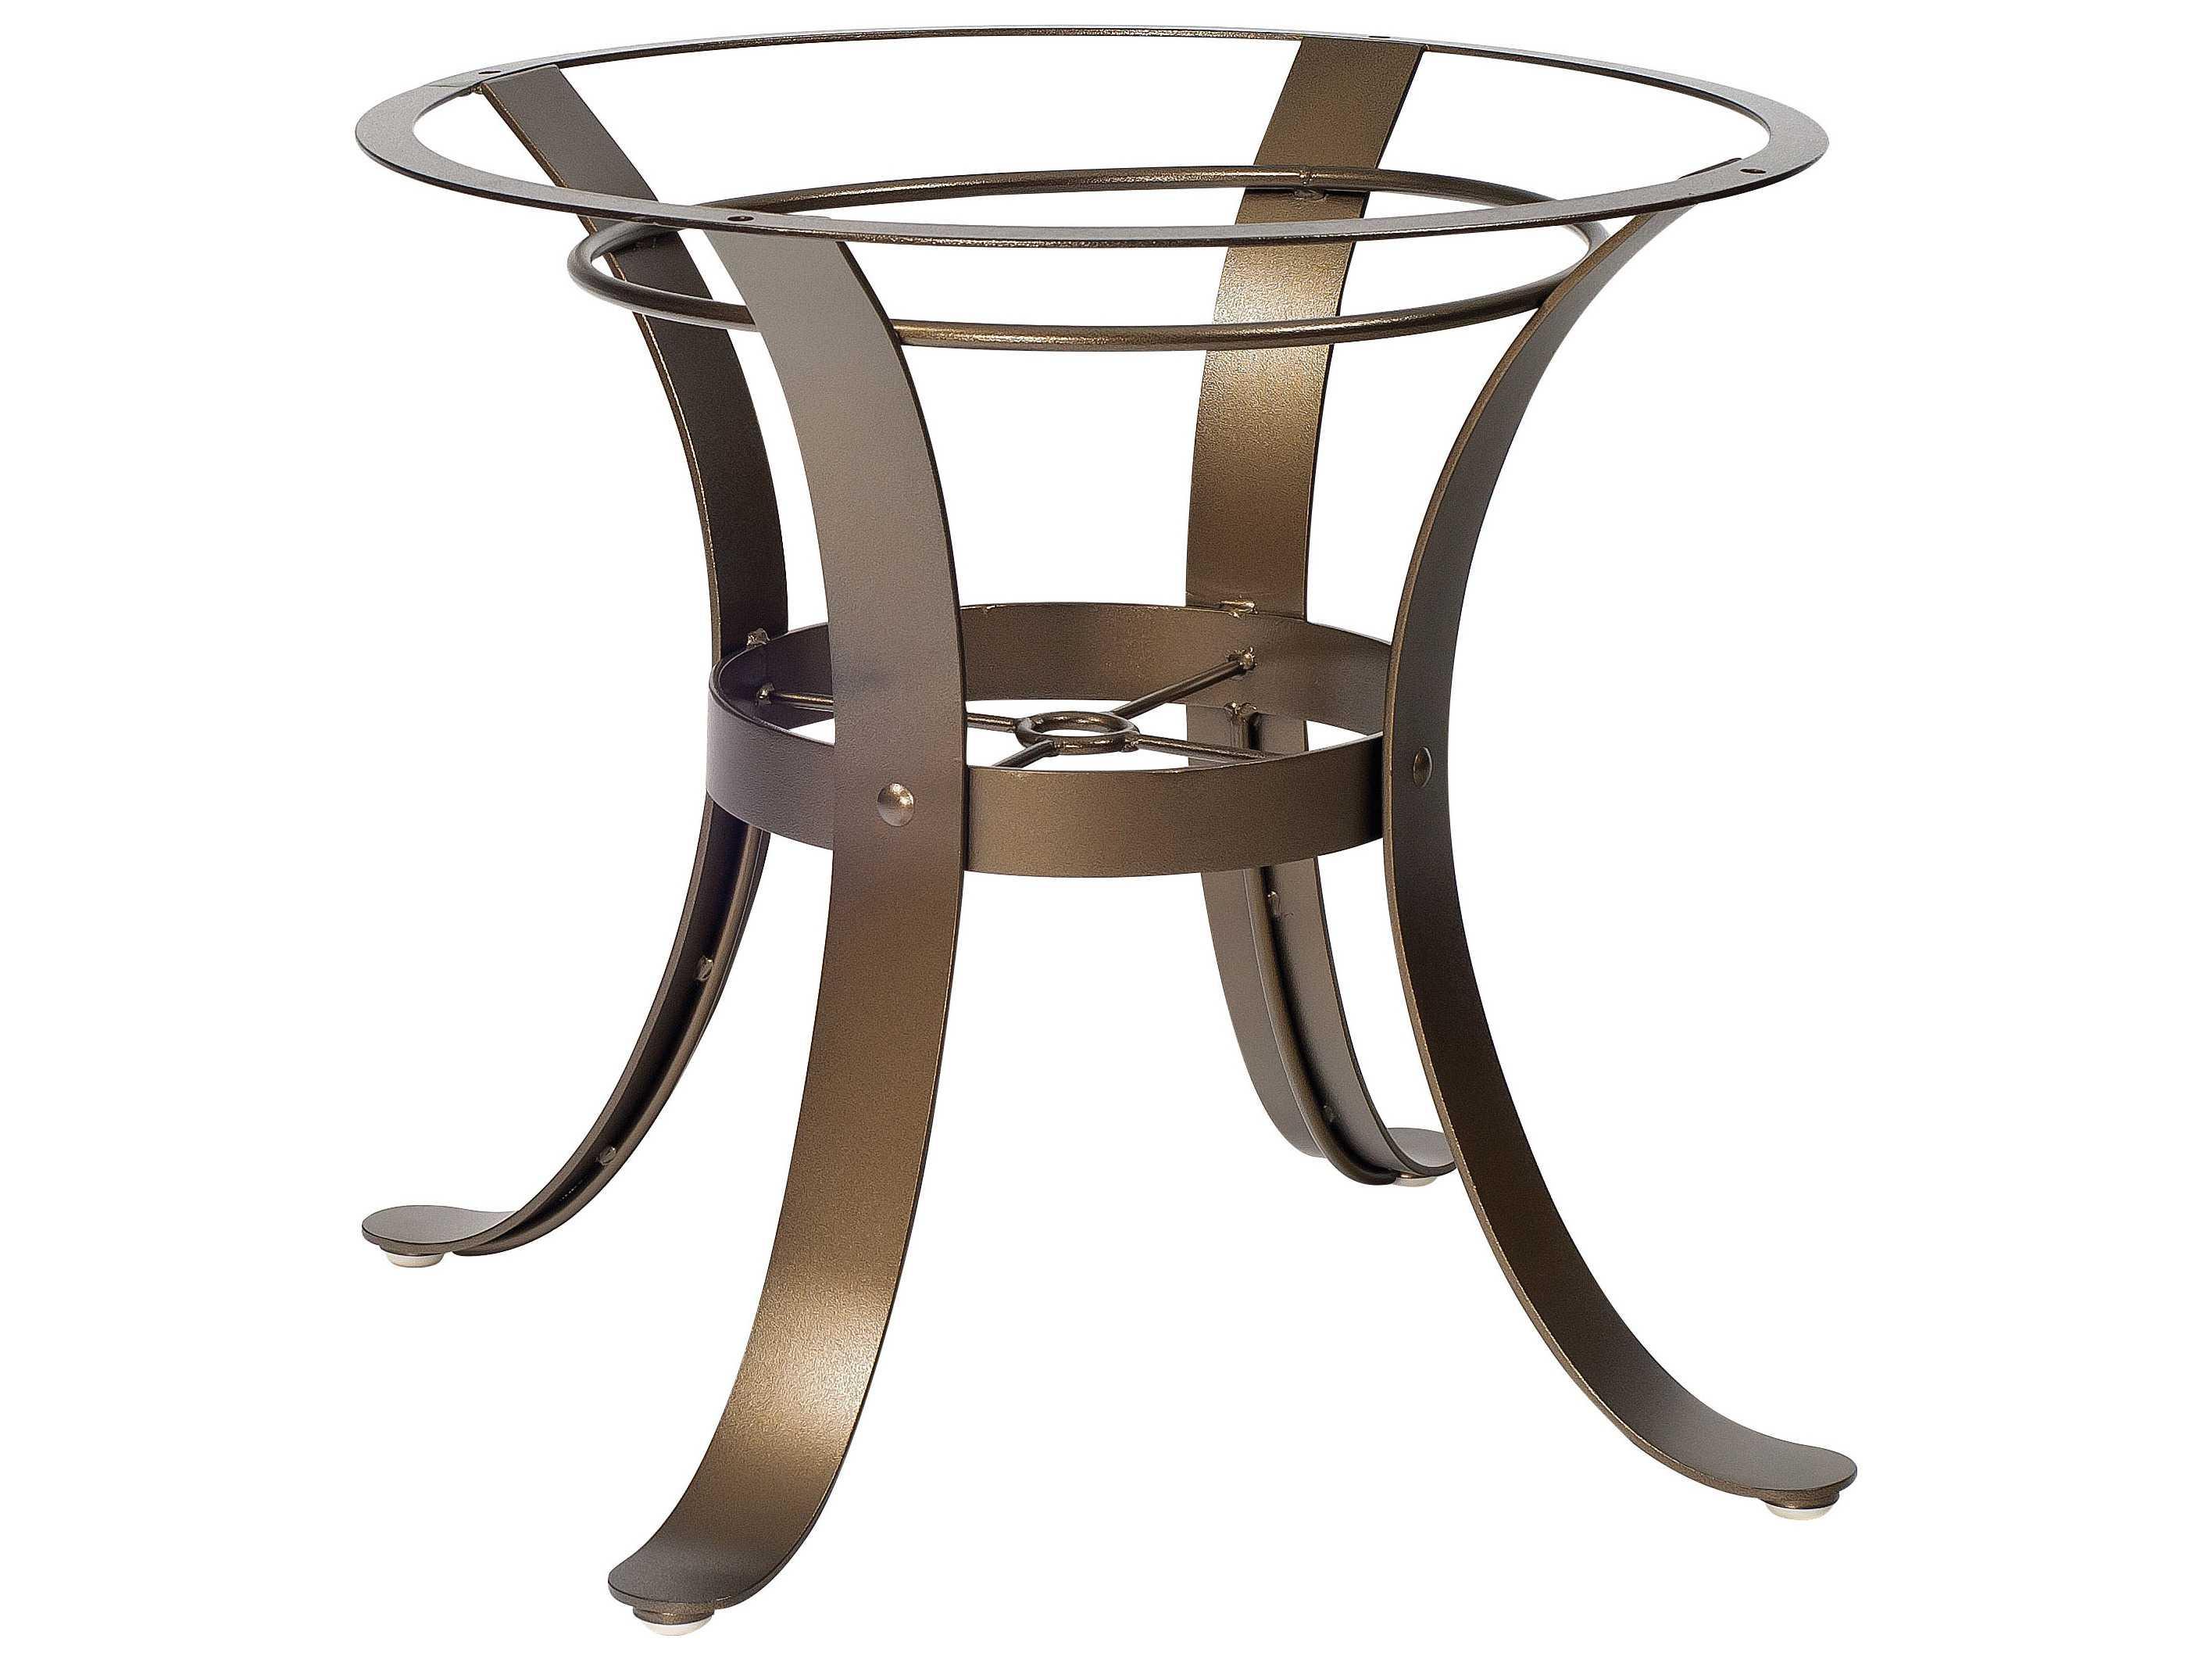 Woodard cascade wrought iron dining table base w